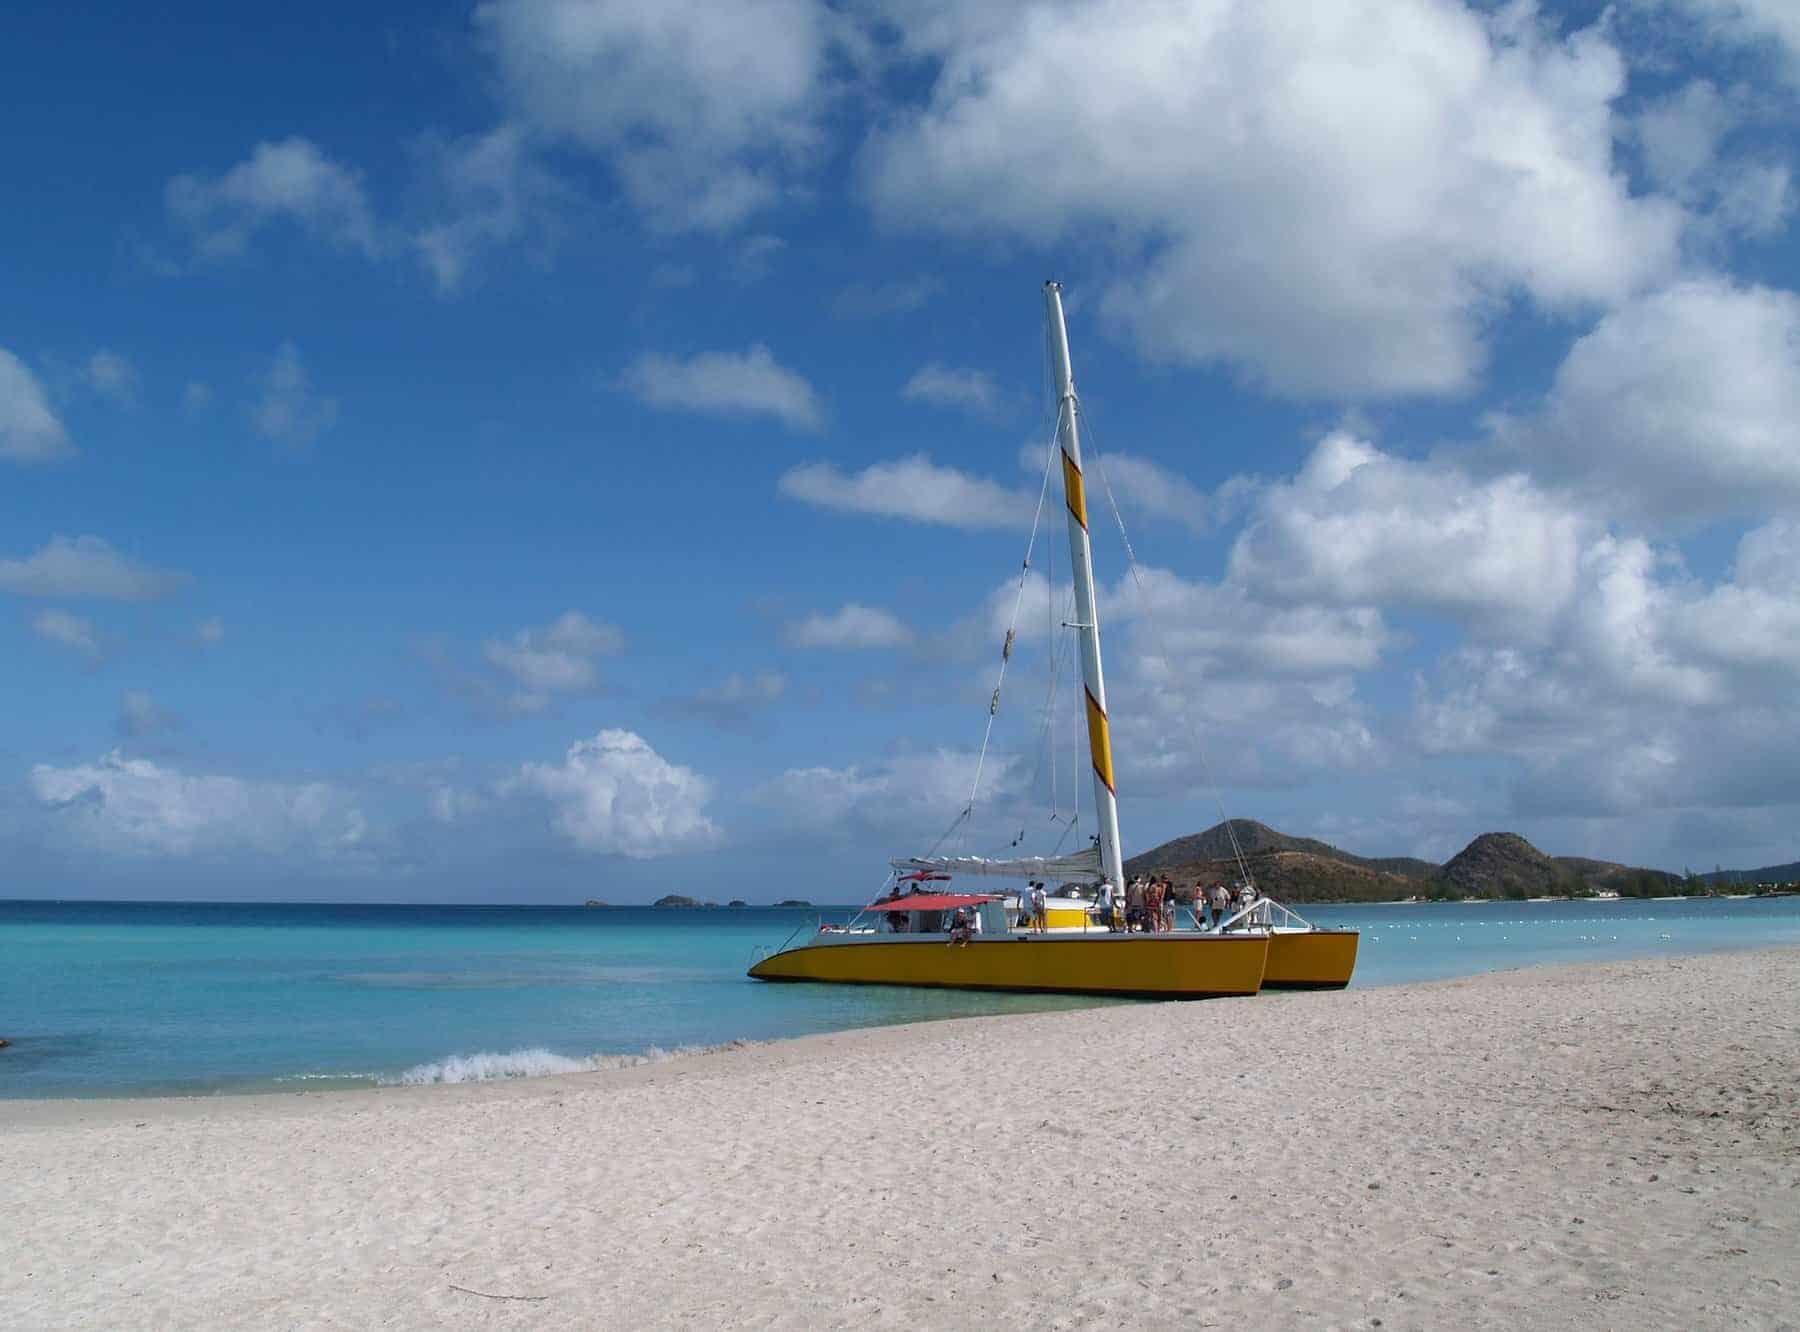 Catamaran at Jolly beach on